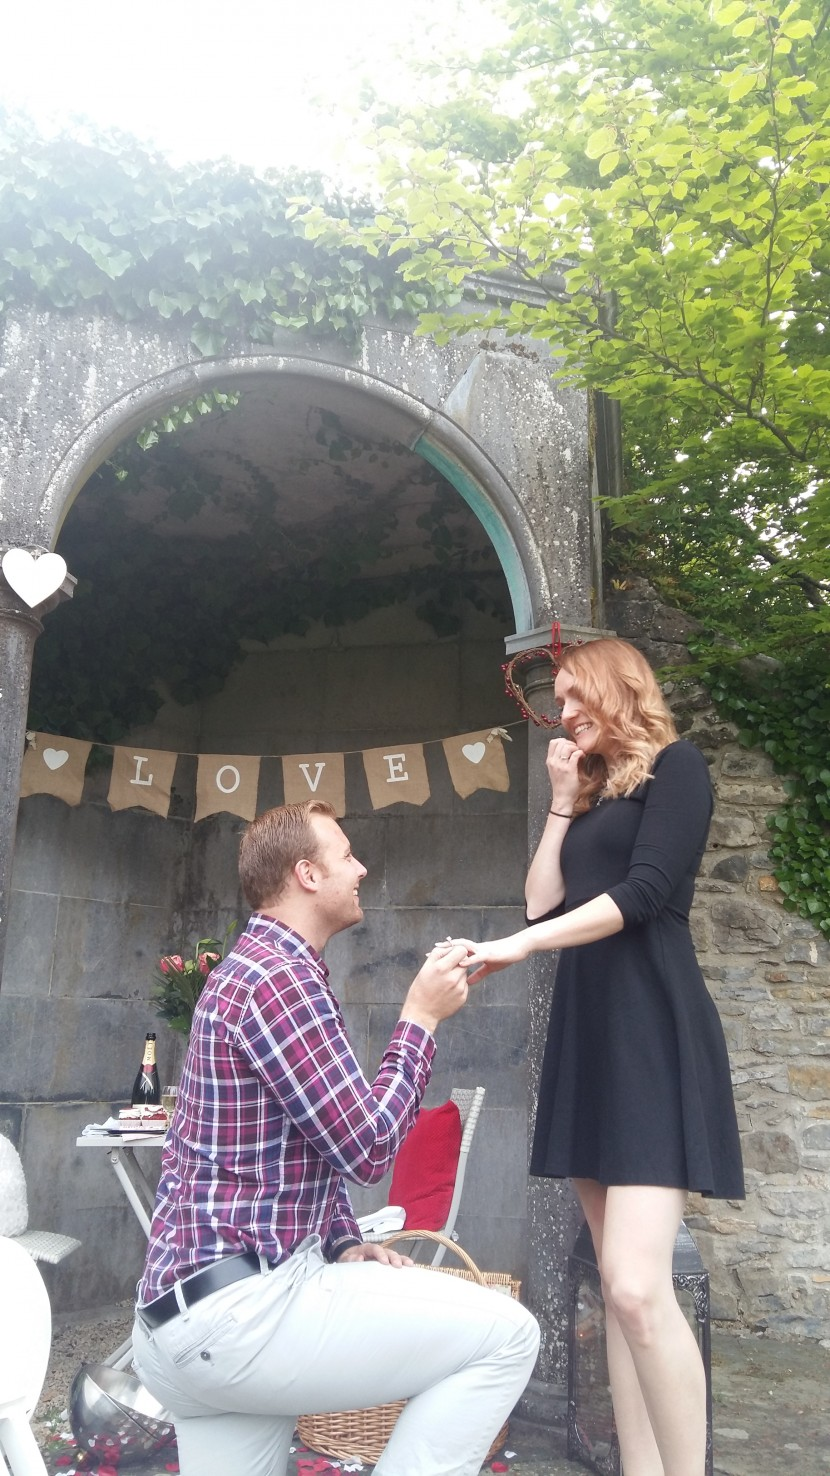 Magical picnic proposal at Mount Juliette Estate